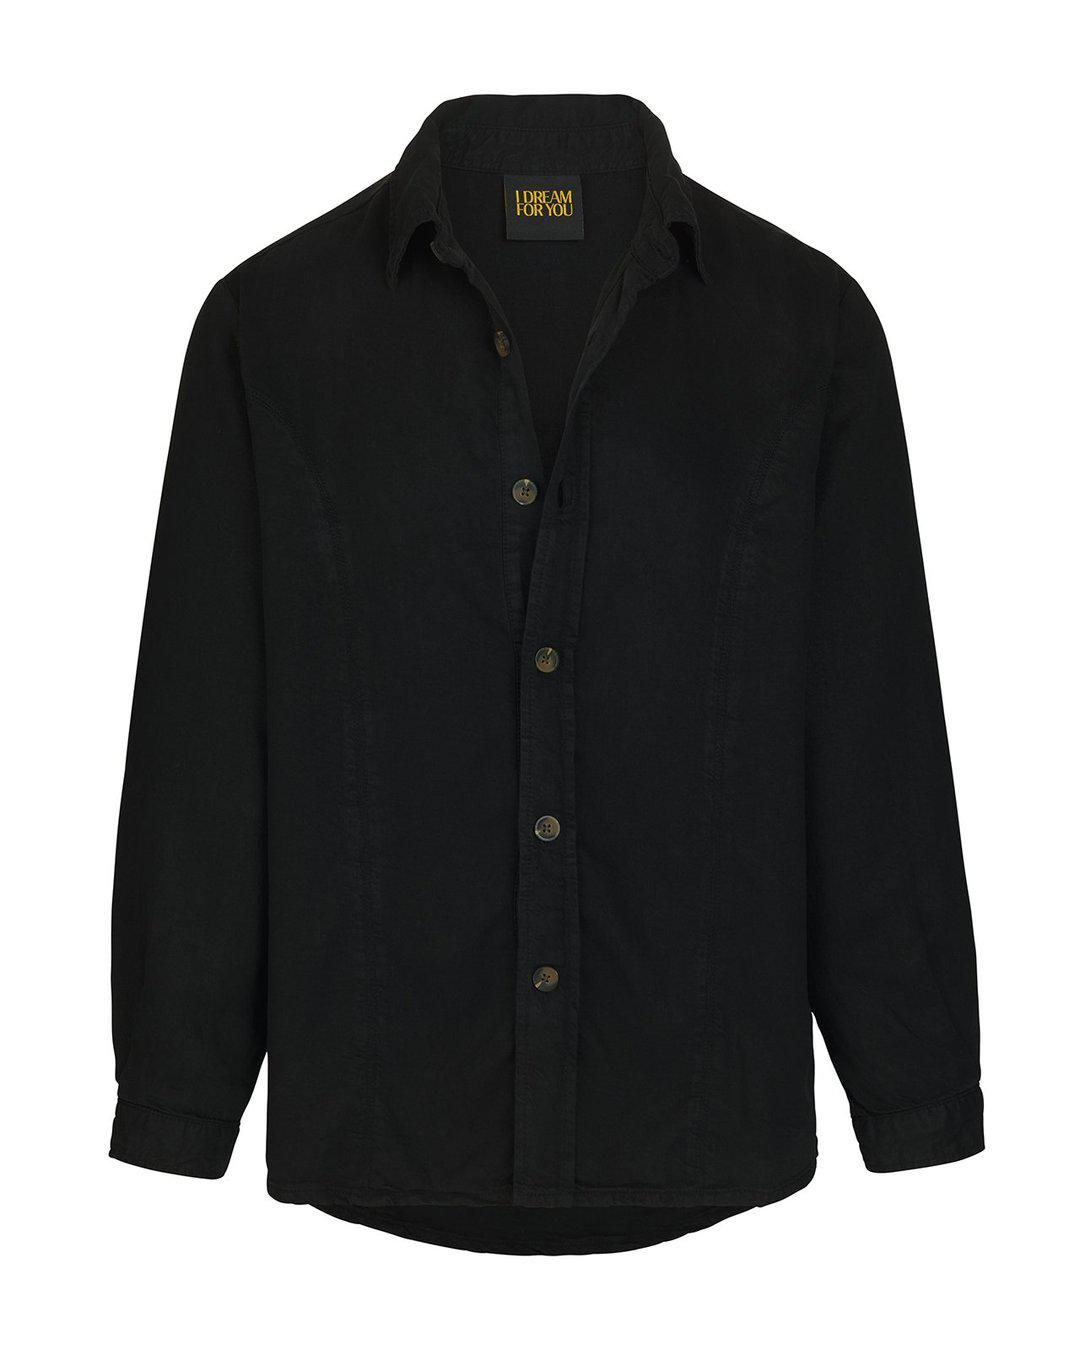 Worker's Jacket